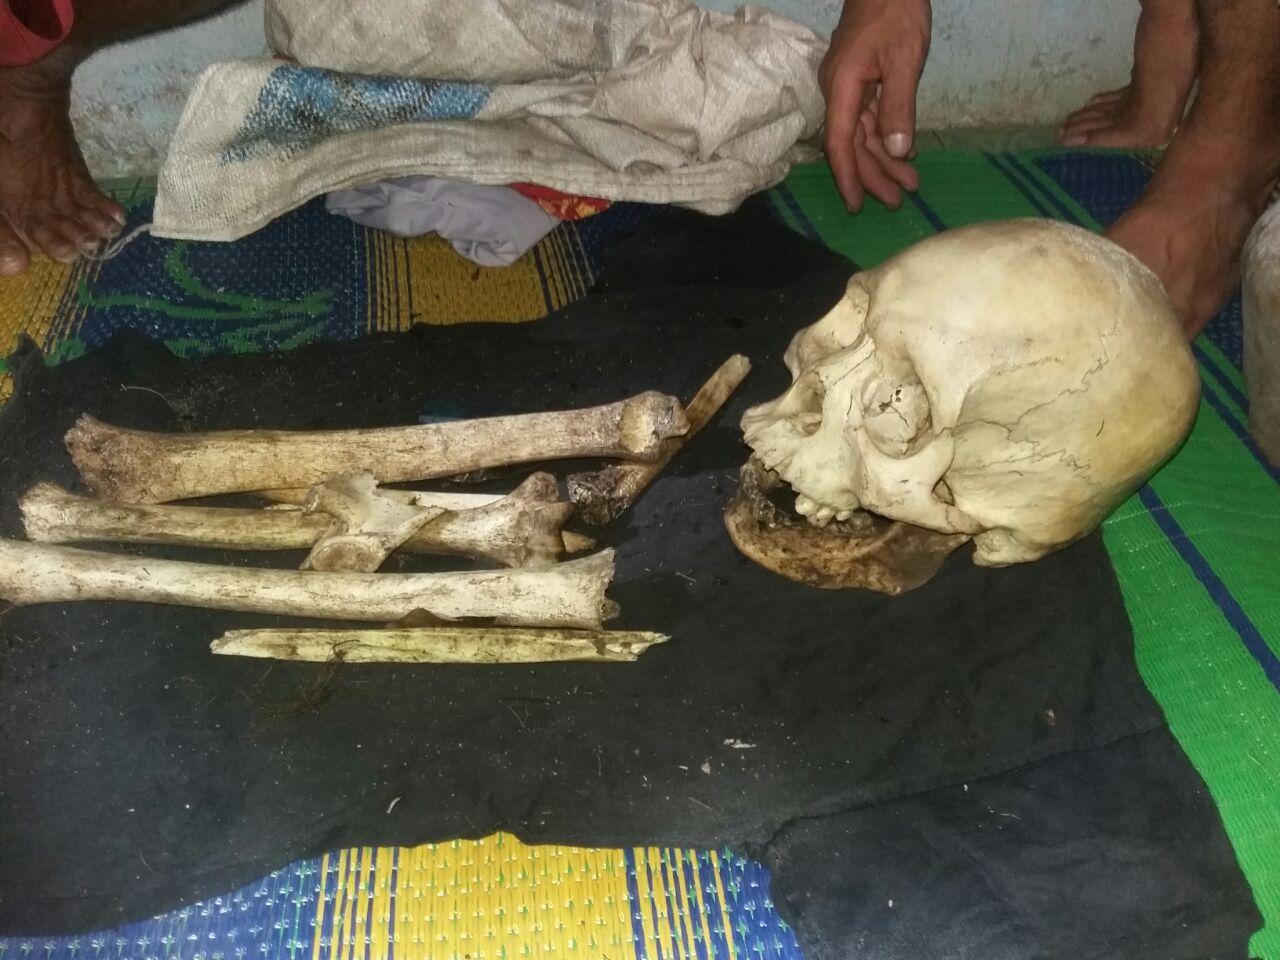 Tengkorak Manusia Ditemukan di Hutan Kecamatan Menjalin